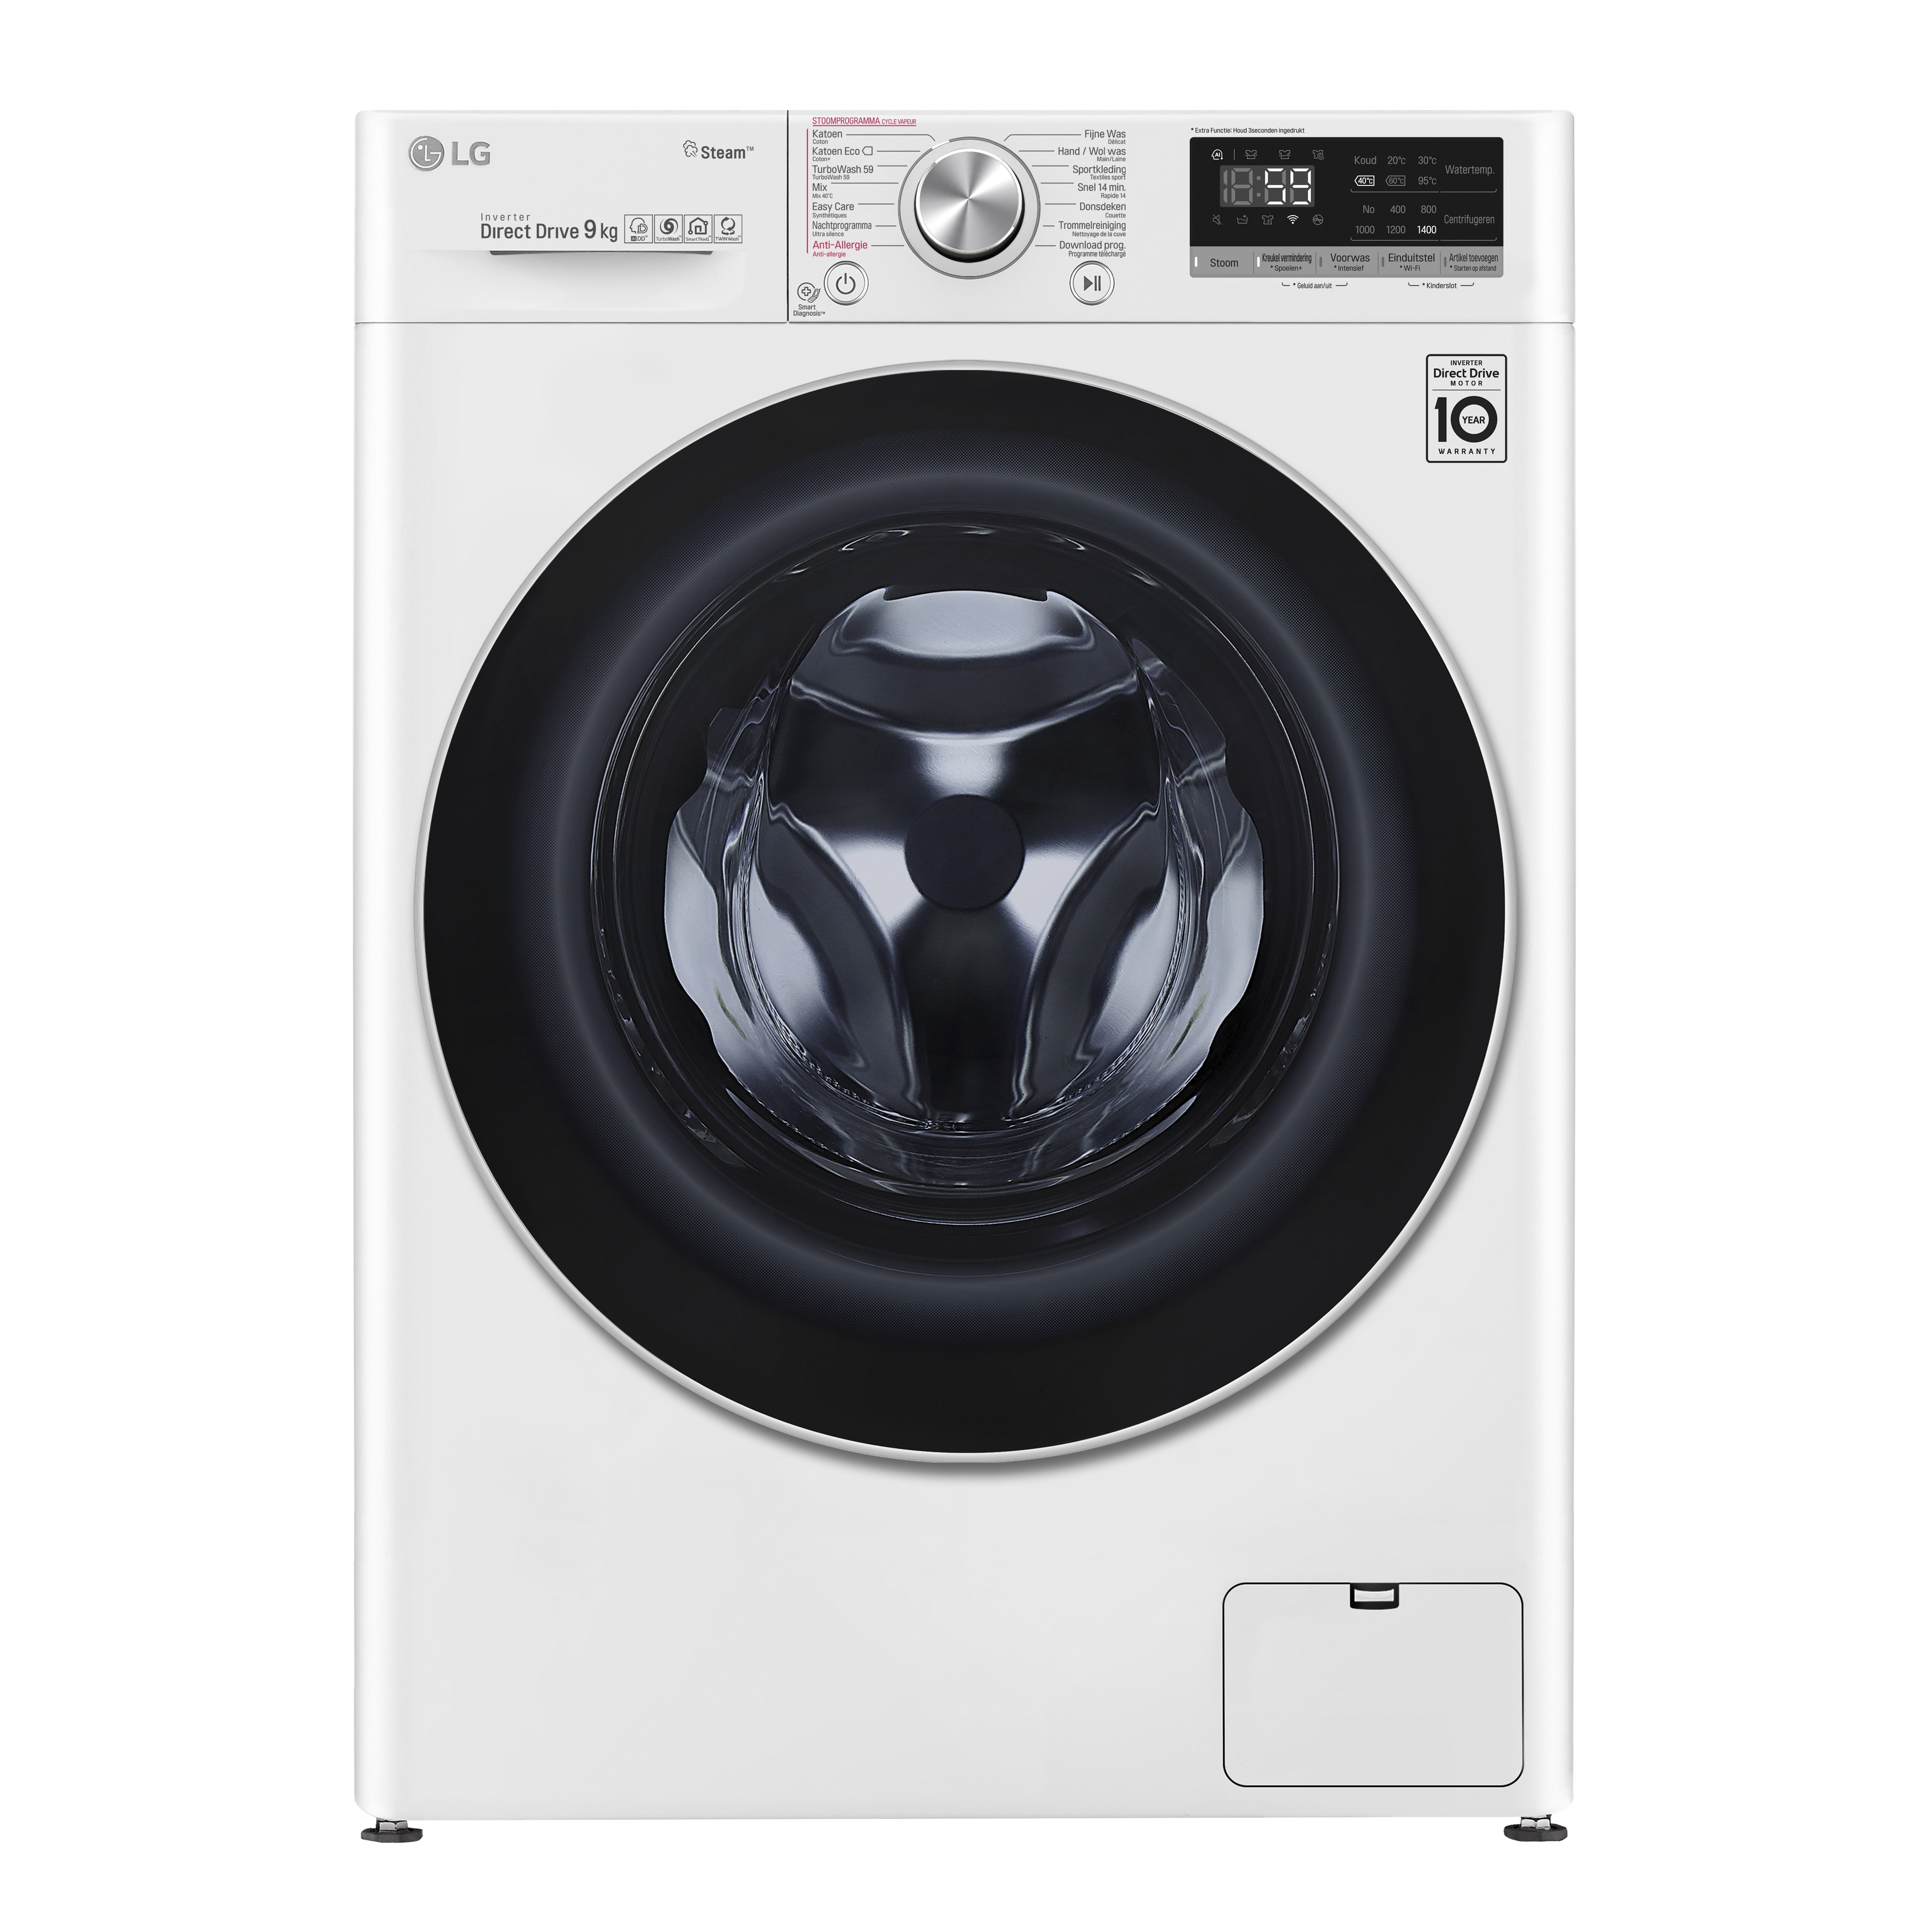 LG F4WV709P1 wasmachine